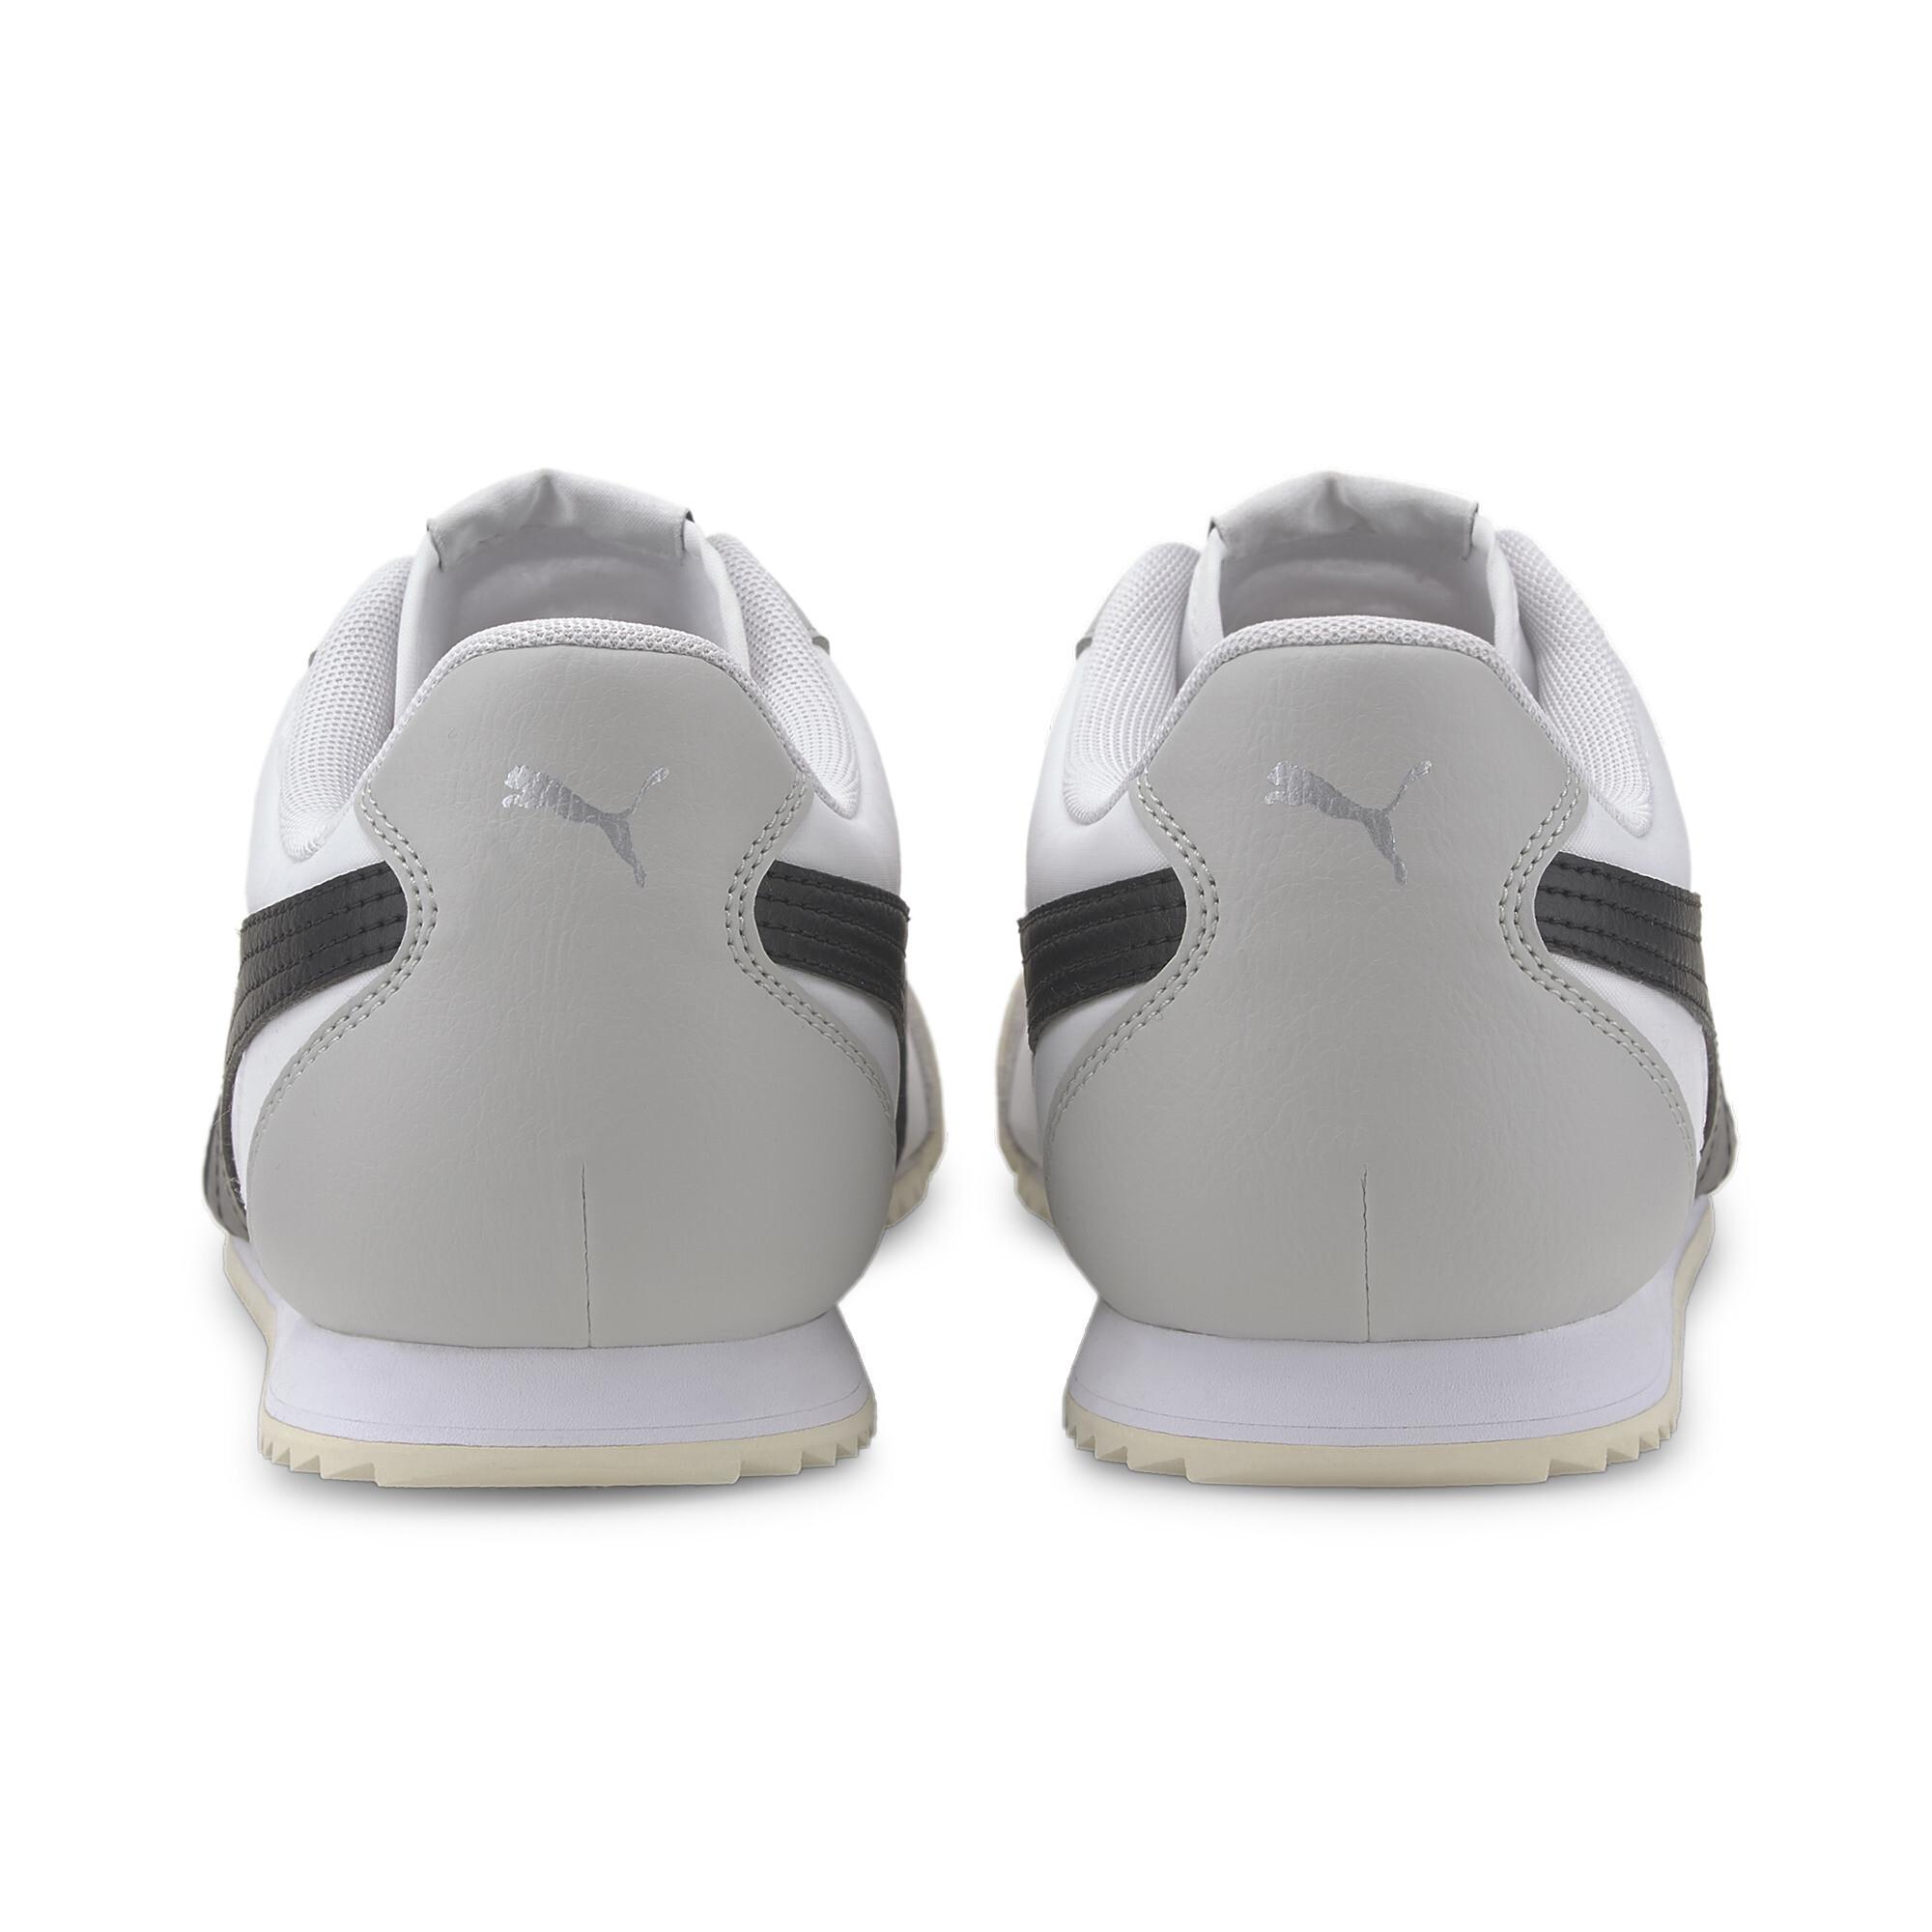 PUMA-Men-039-s-Turino-NL-Sneakers thumbnail 3